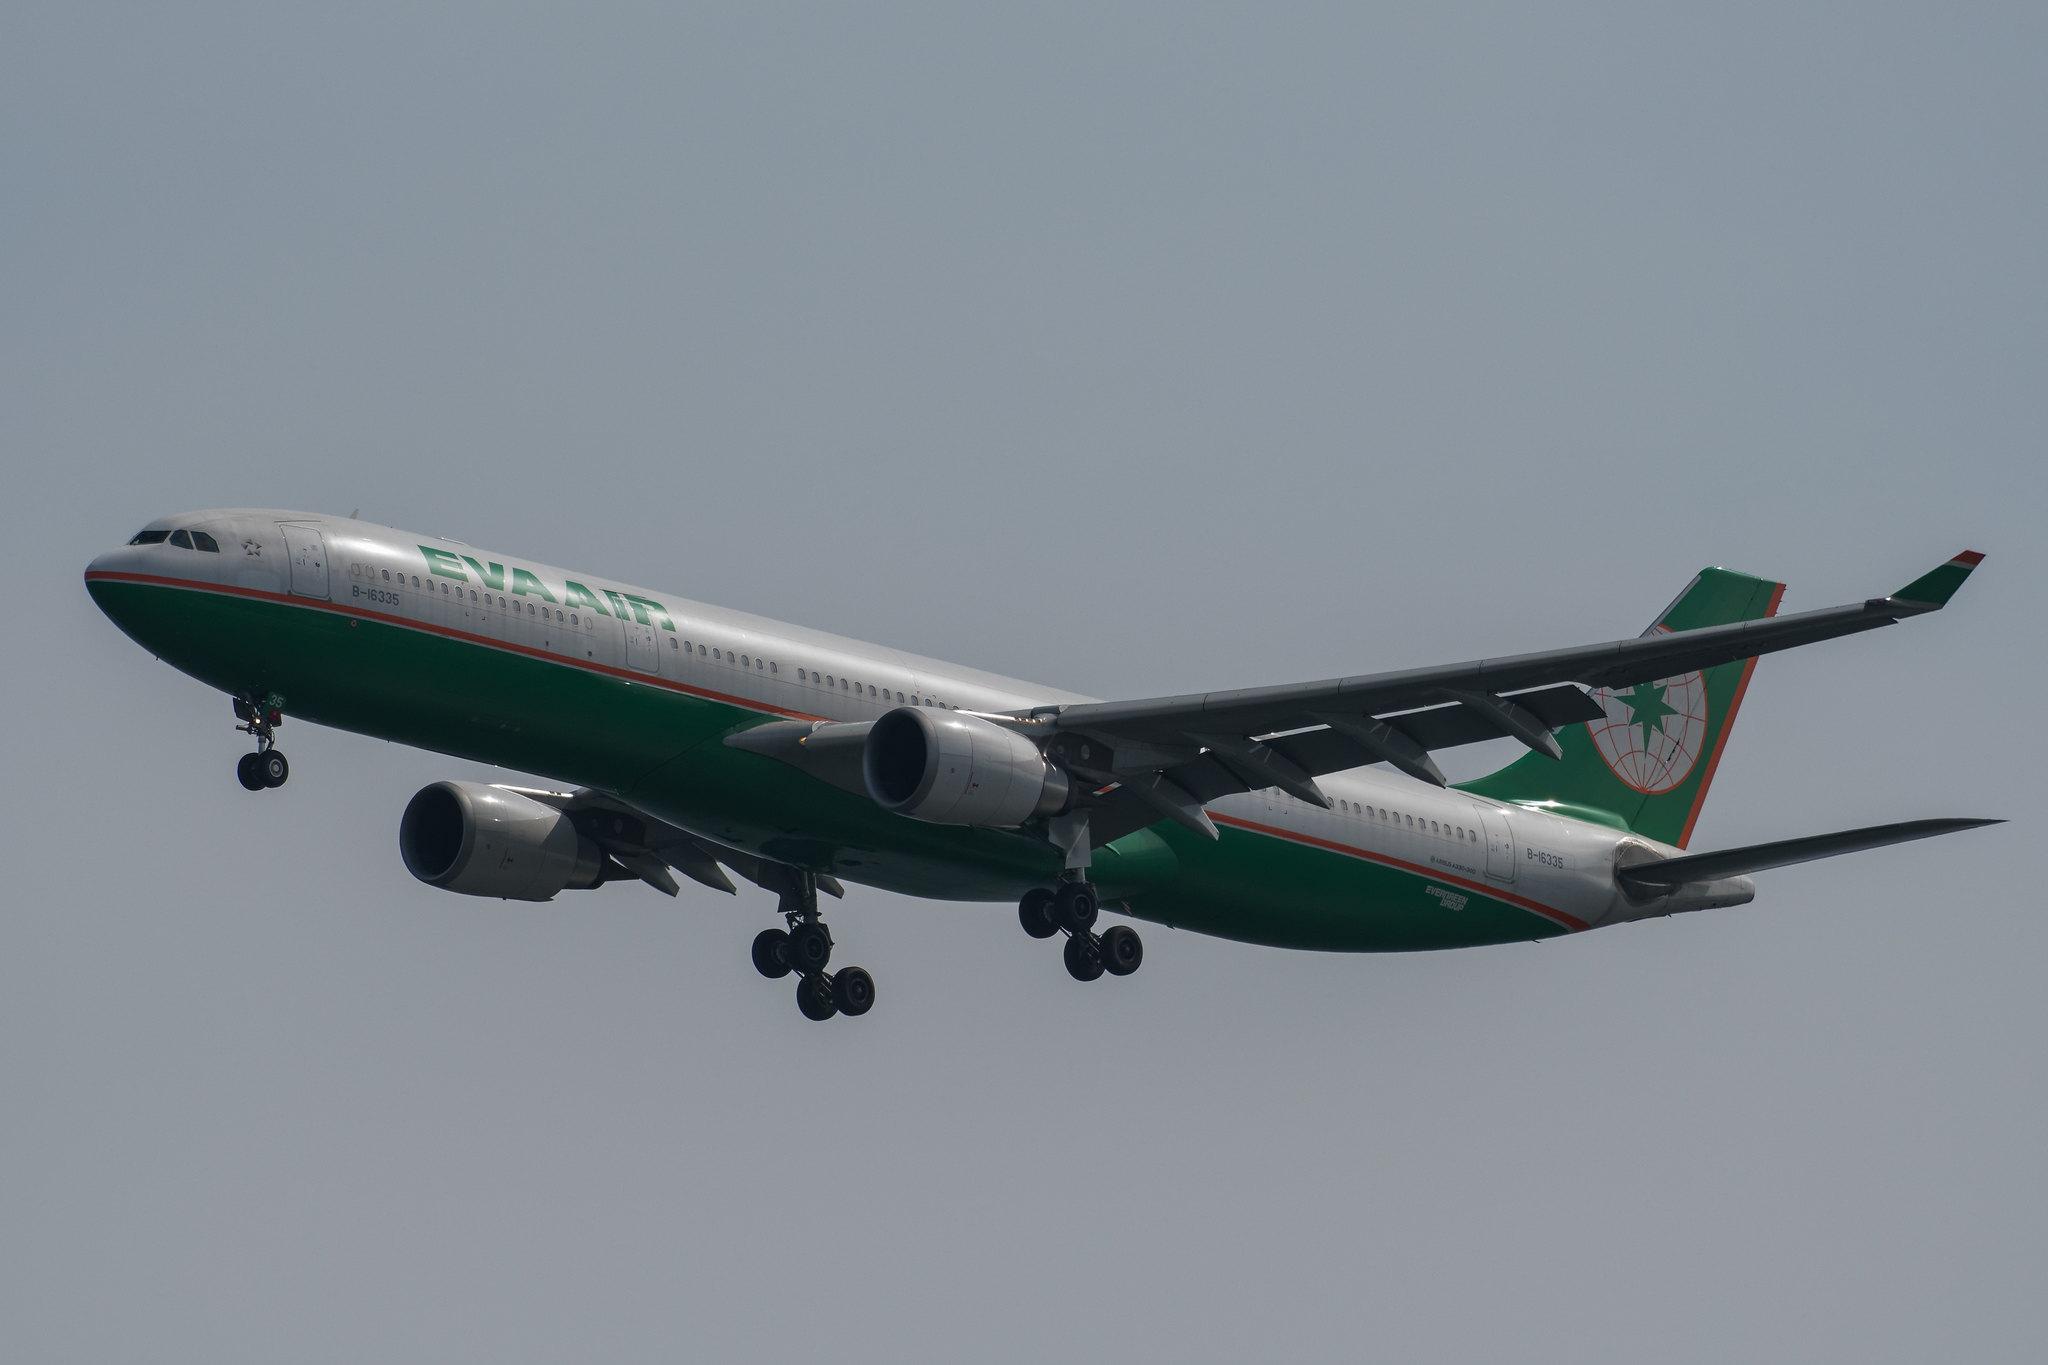 B-16335